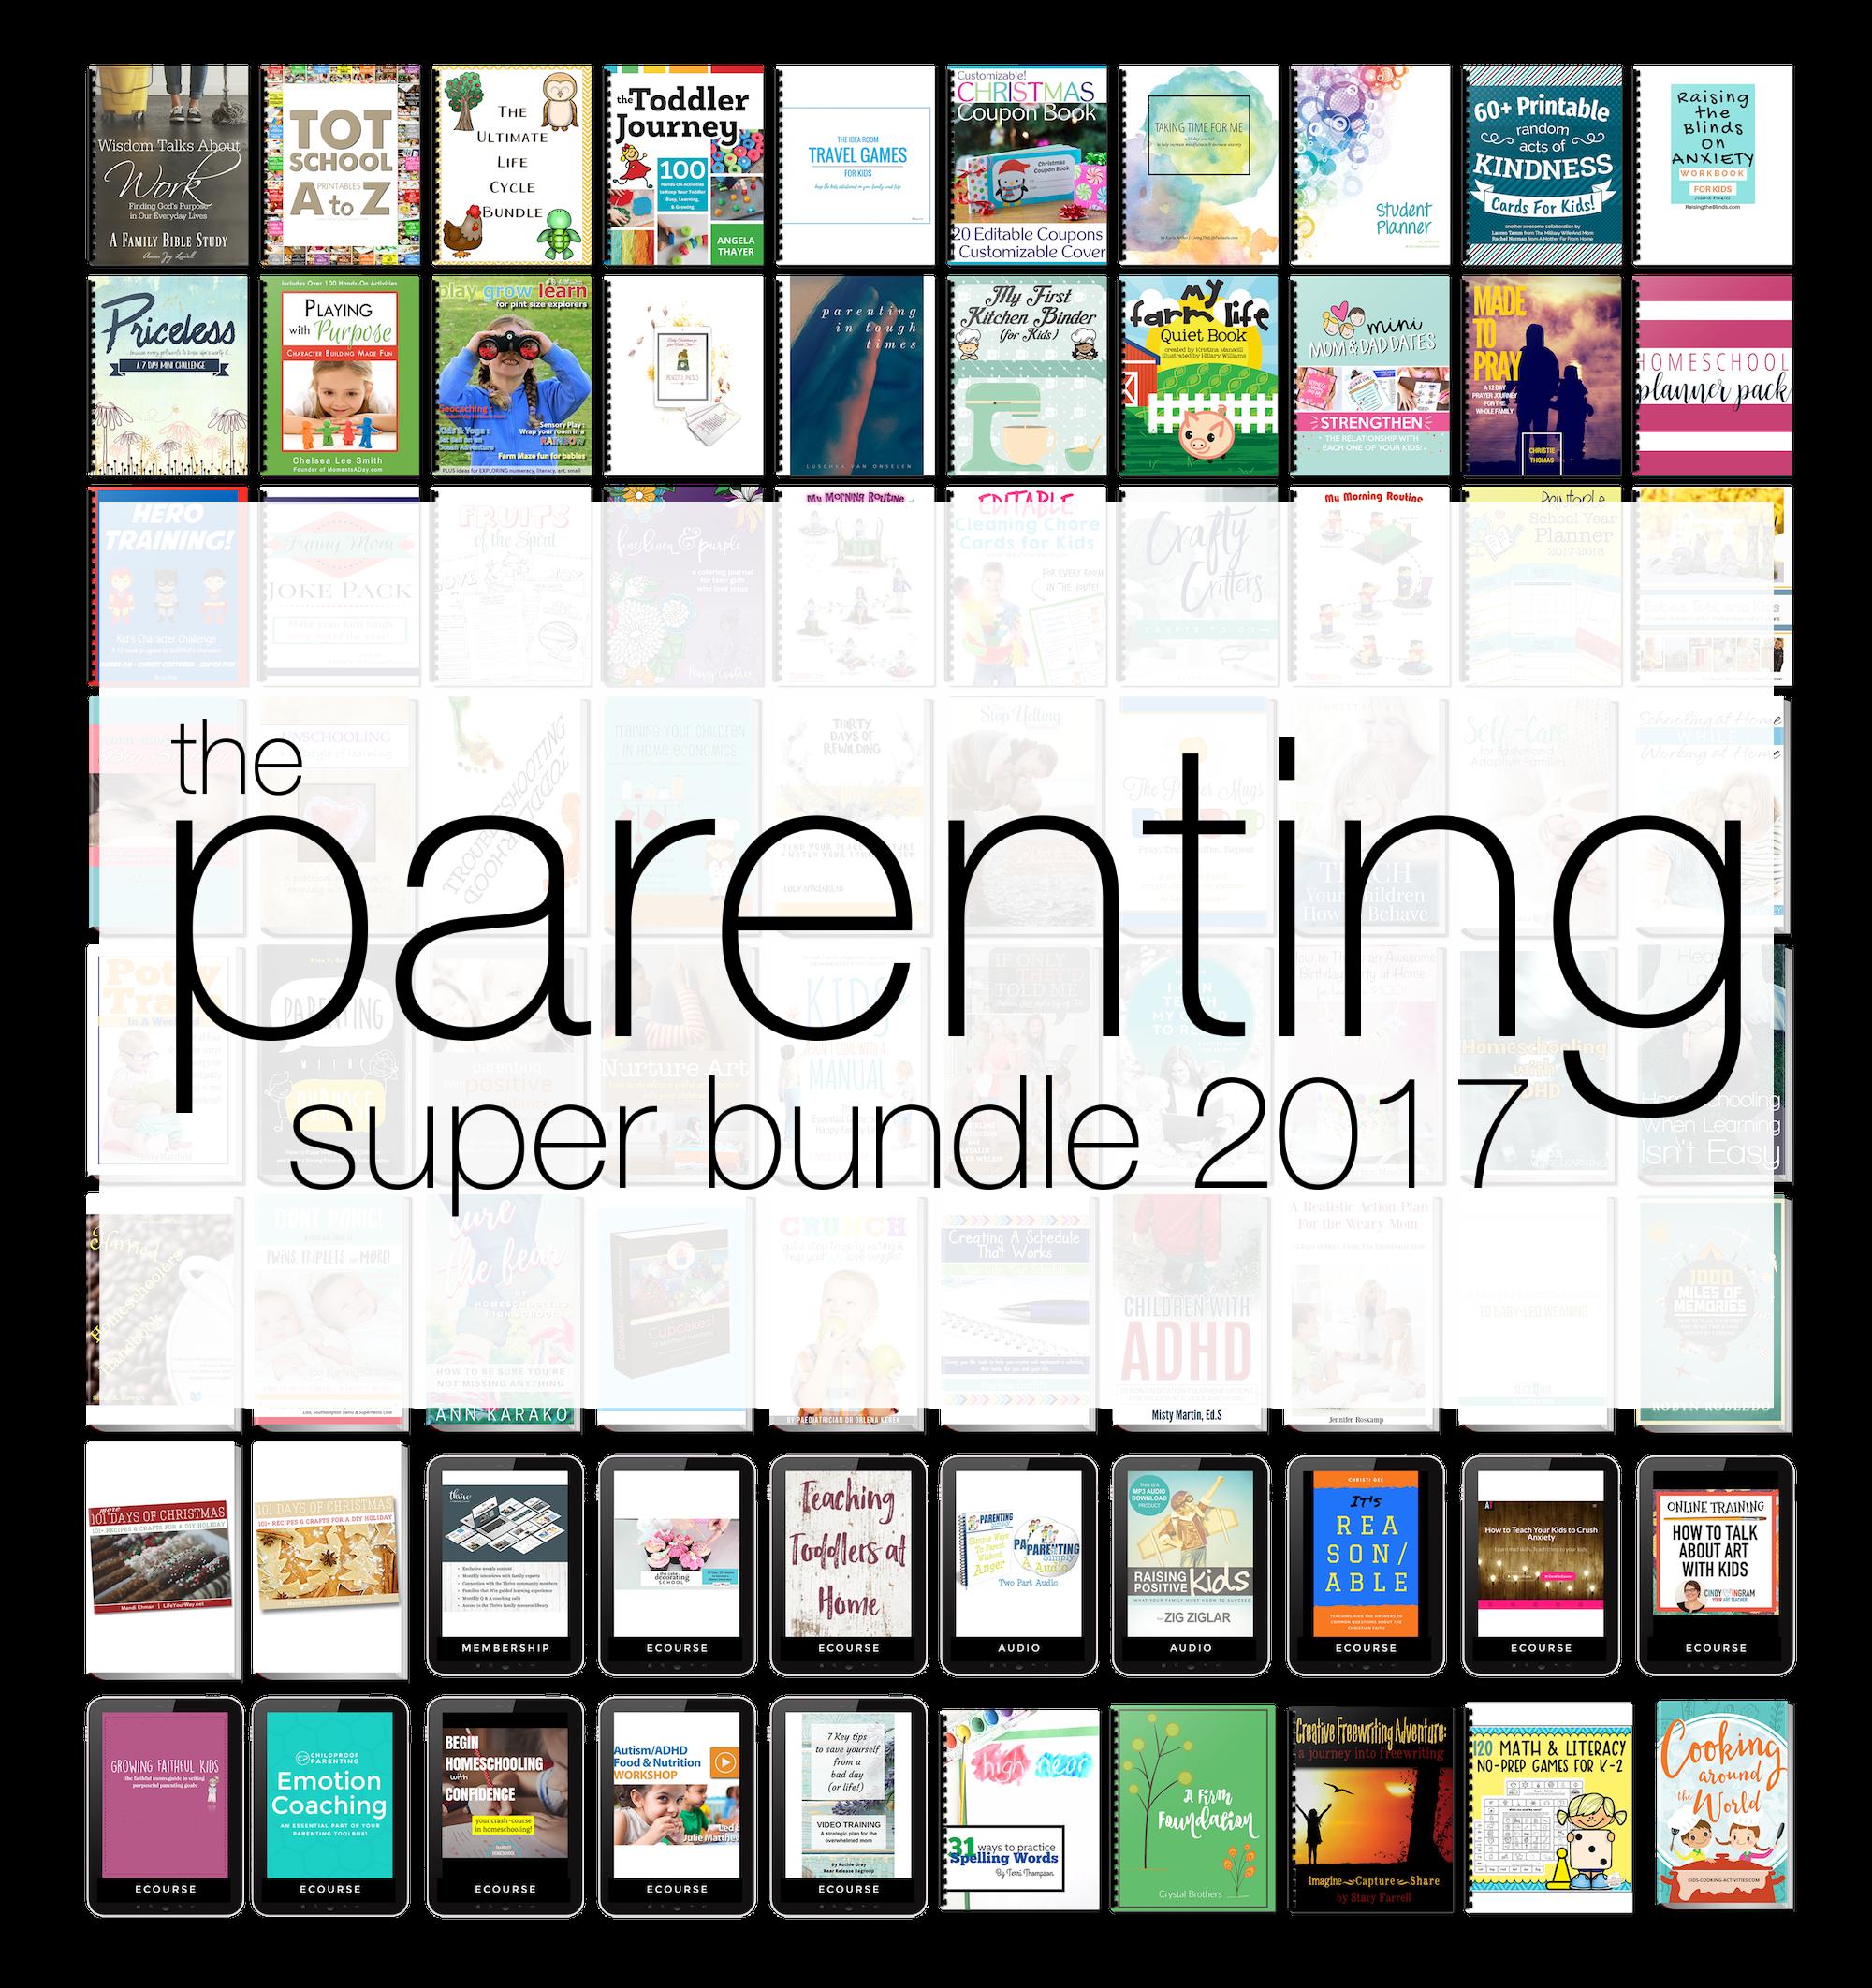 Ultimate Bundles Parenting Super Bundle Review